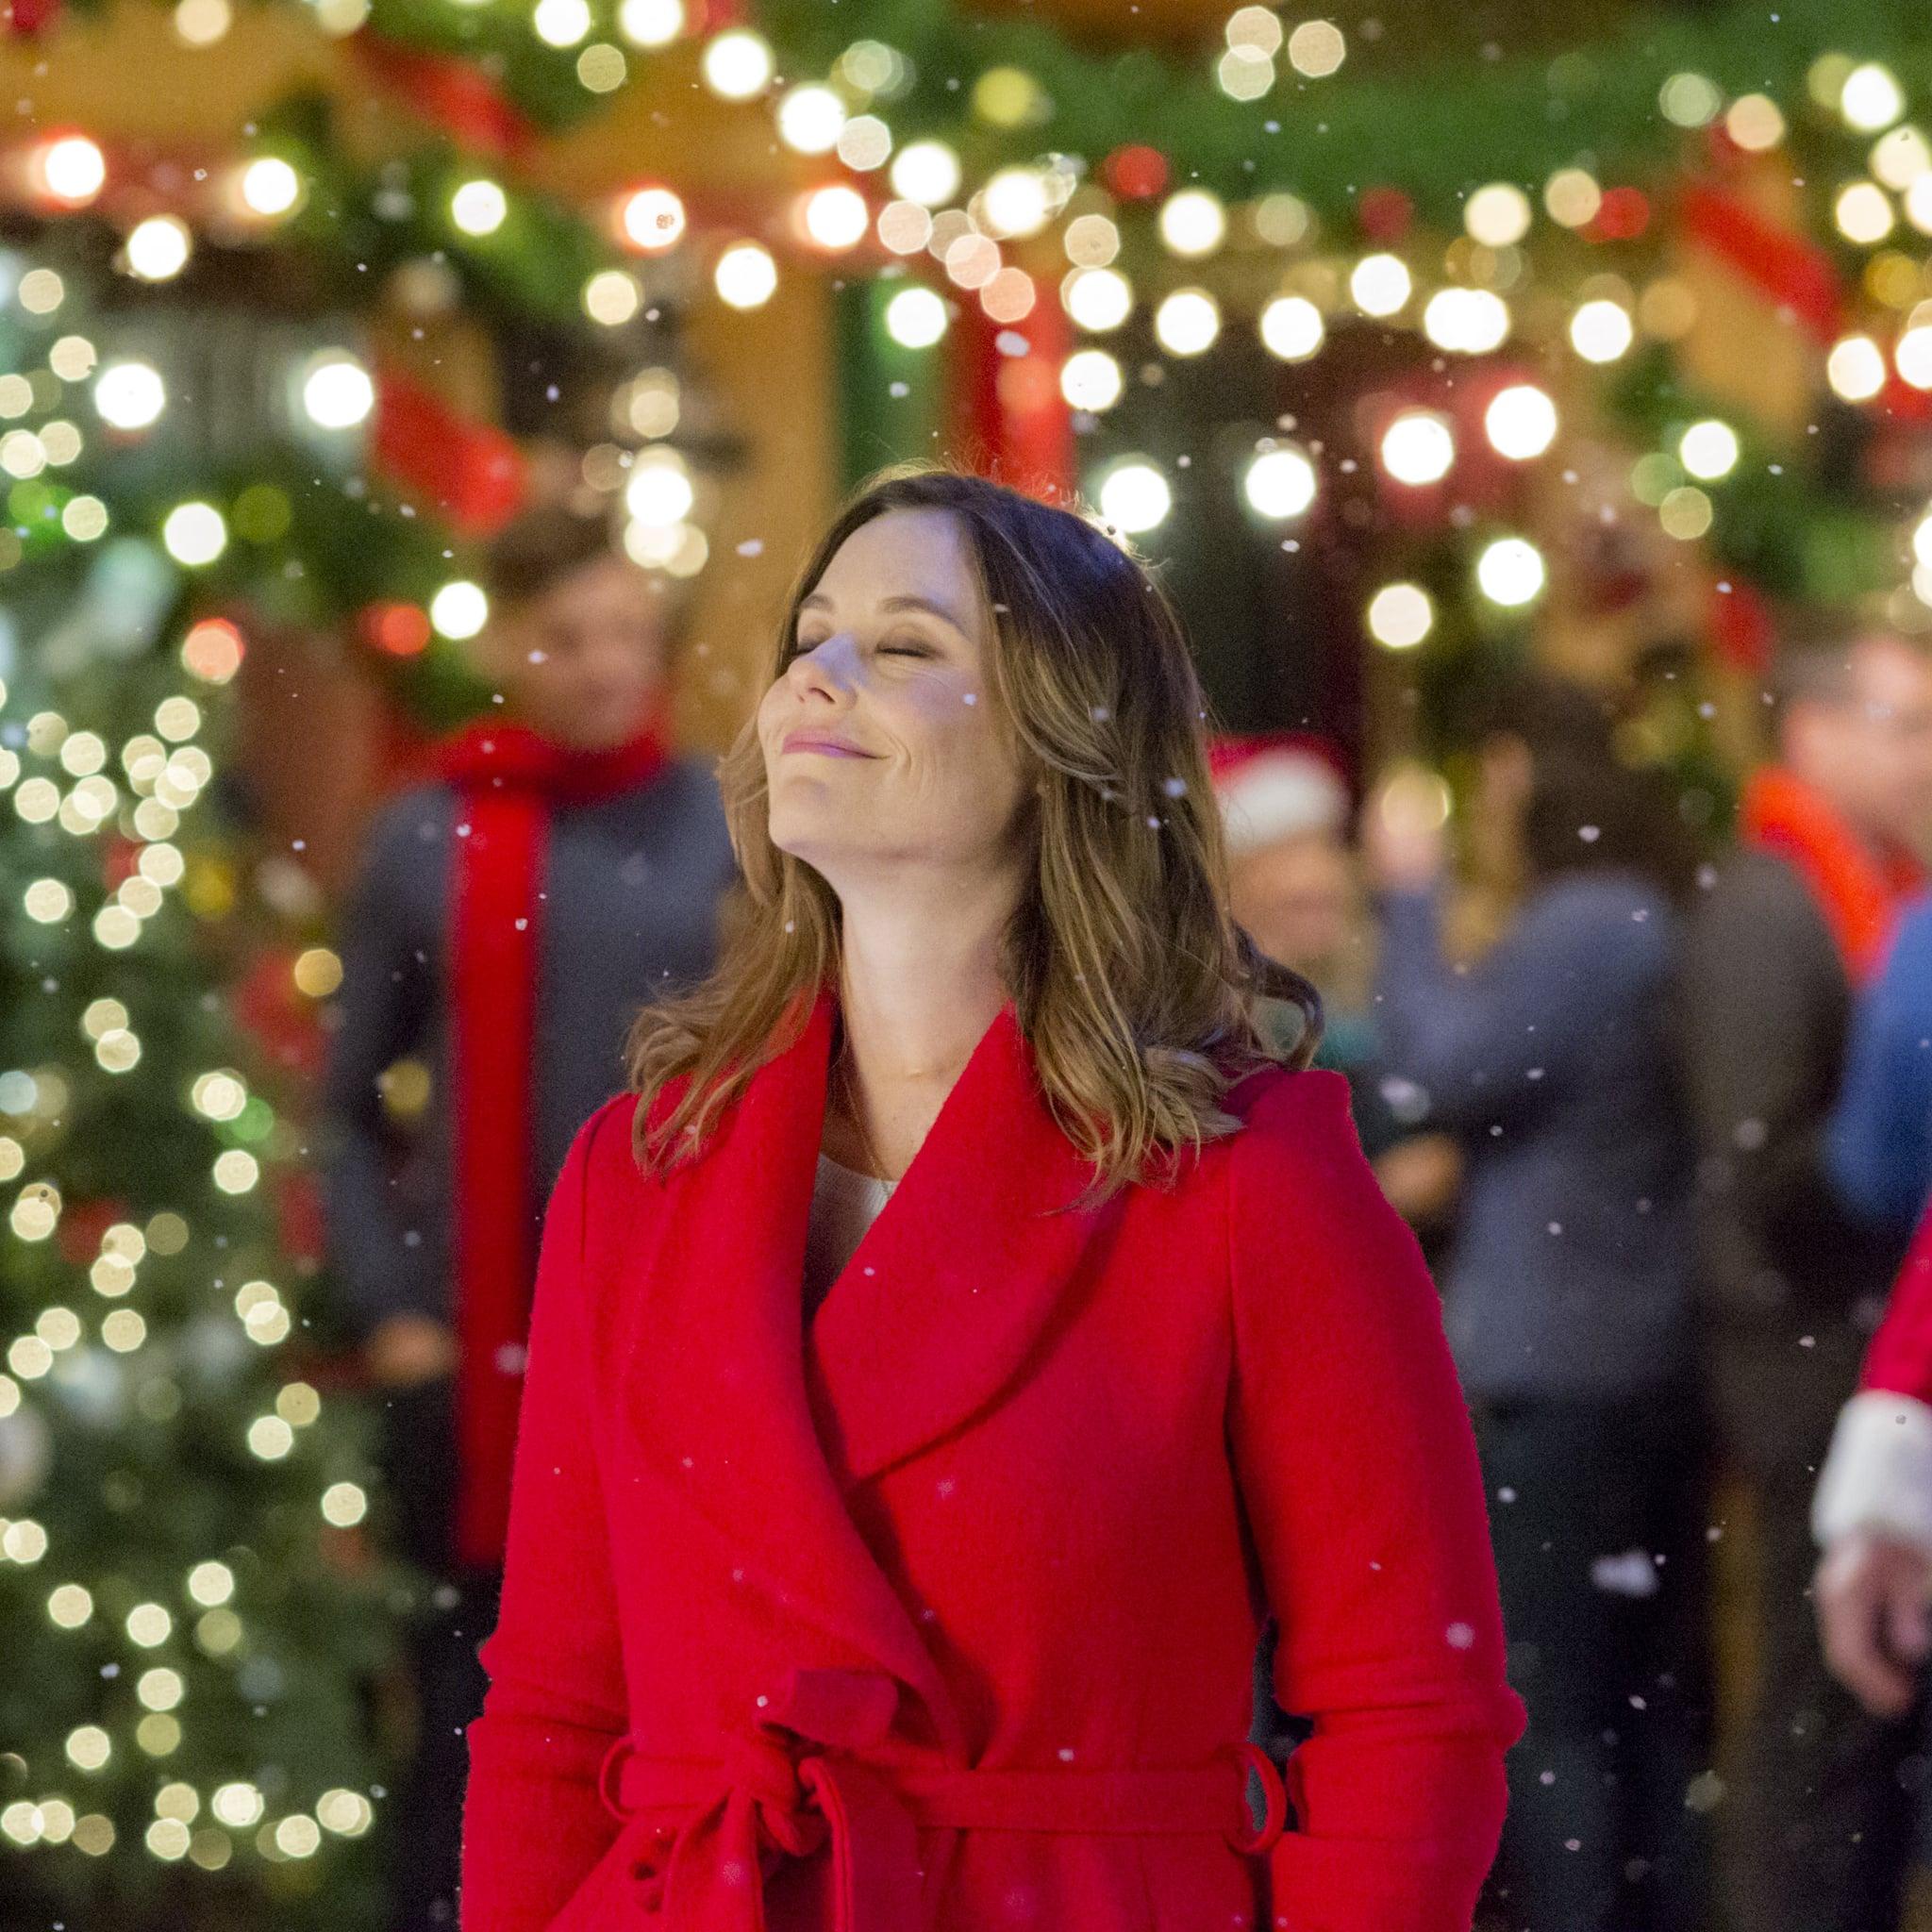 Hallmark Christmas Movie Filming Locations You Can Visit Popsugar Smart Living